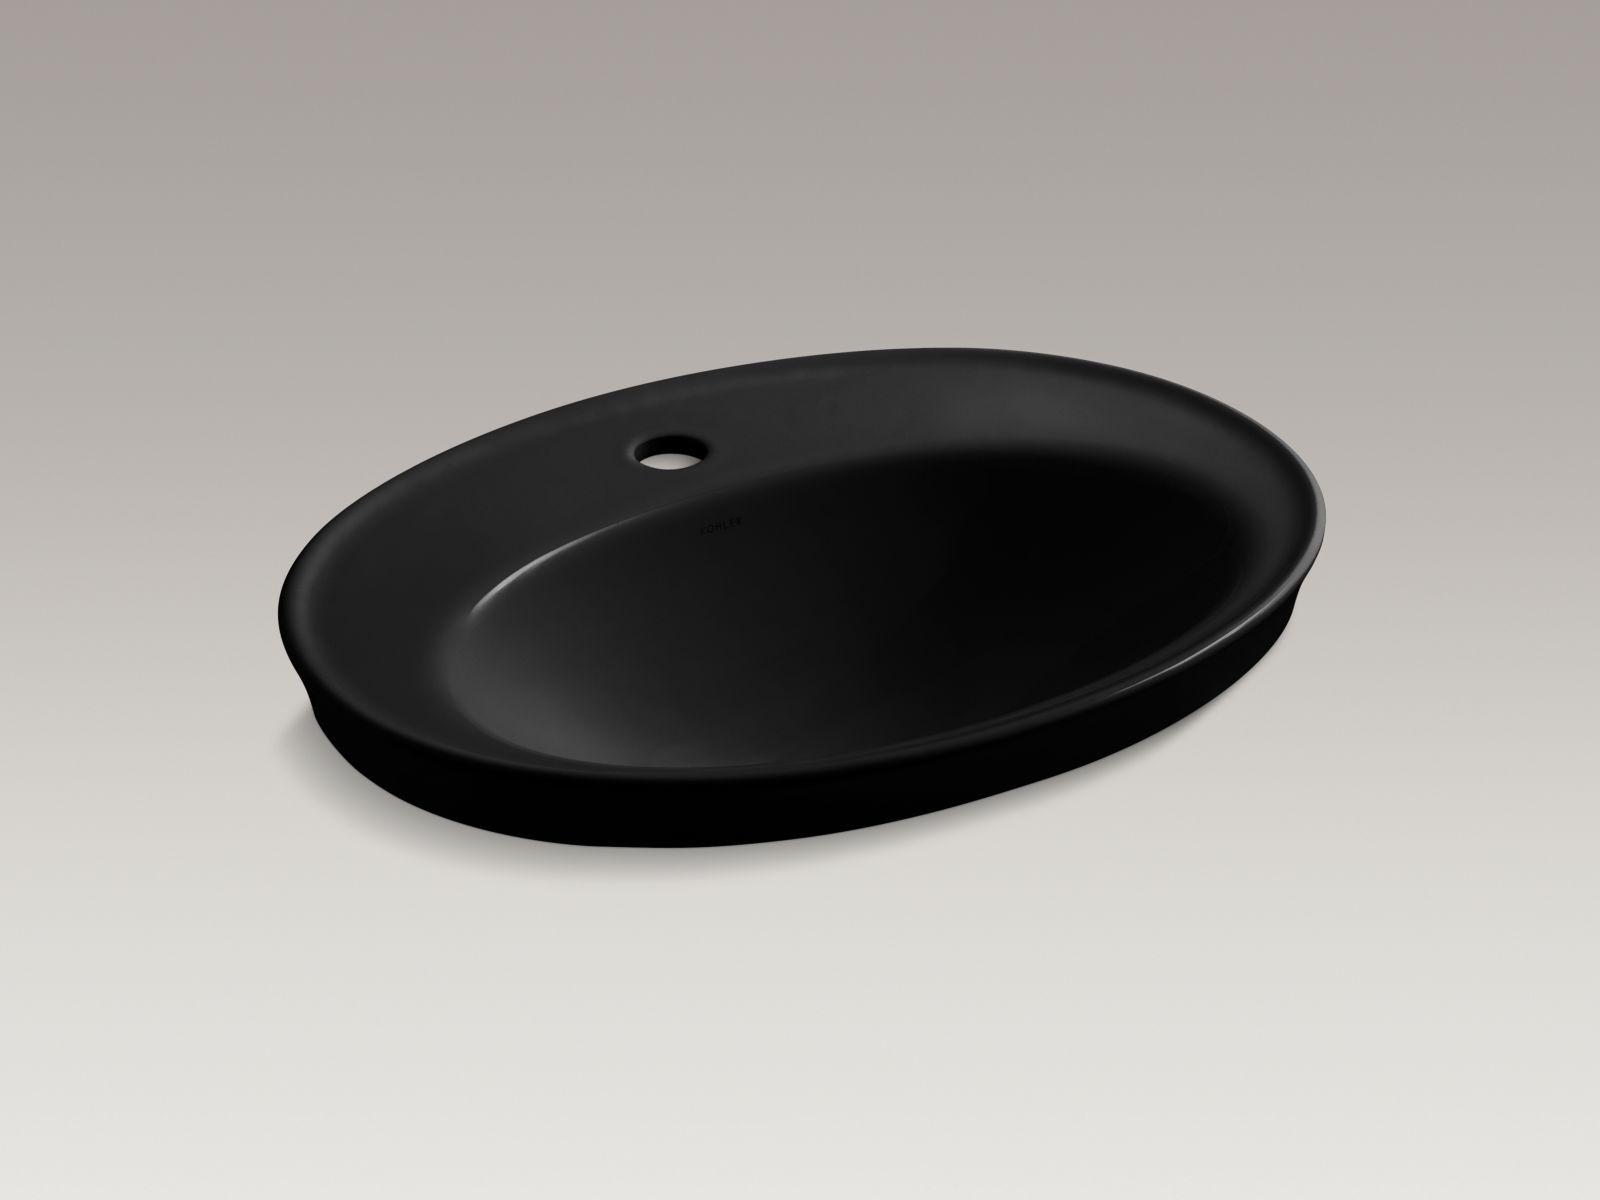 Kohler Serif® K-2075-1-7 Drop-in bathroom sink with single faucet hole Black Black